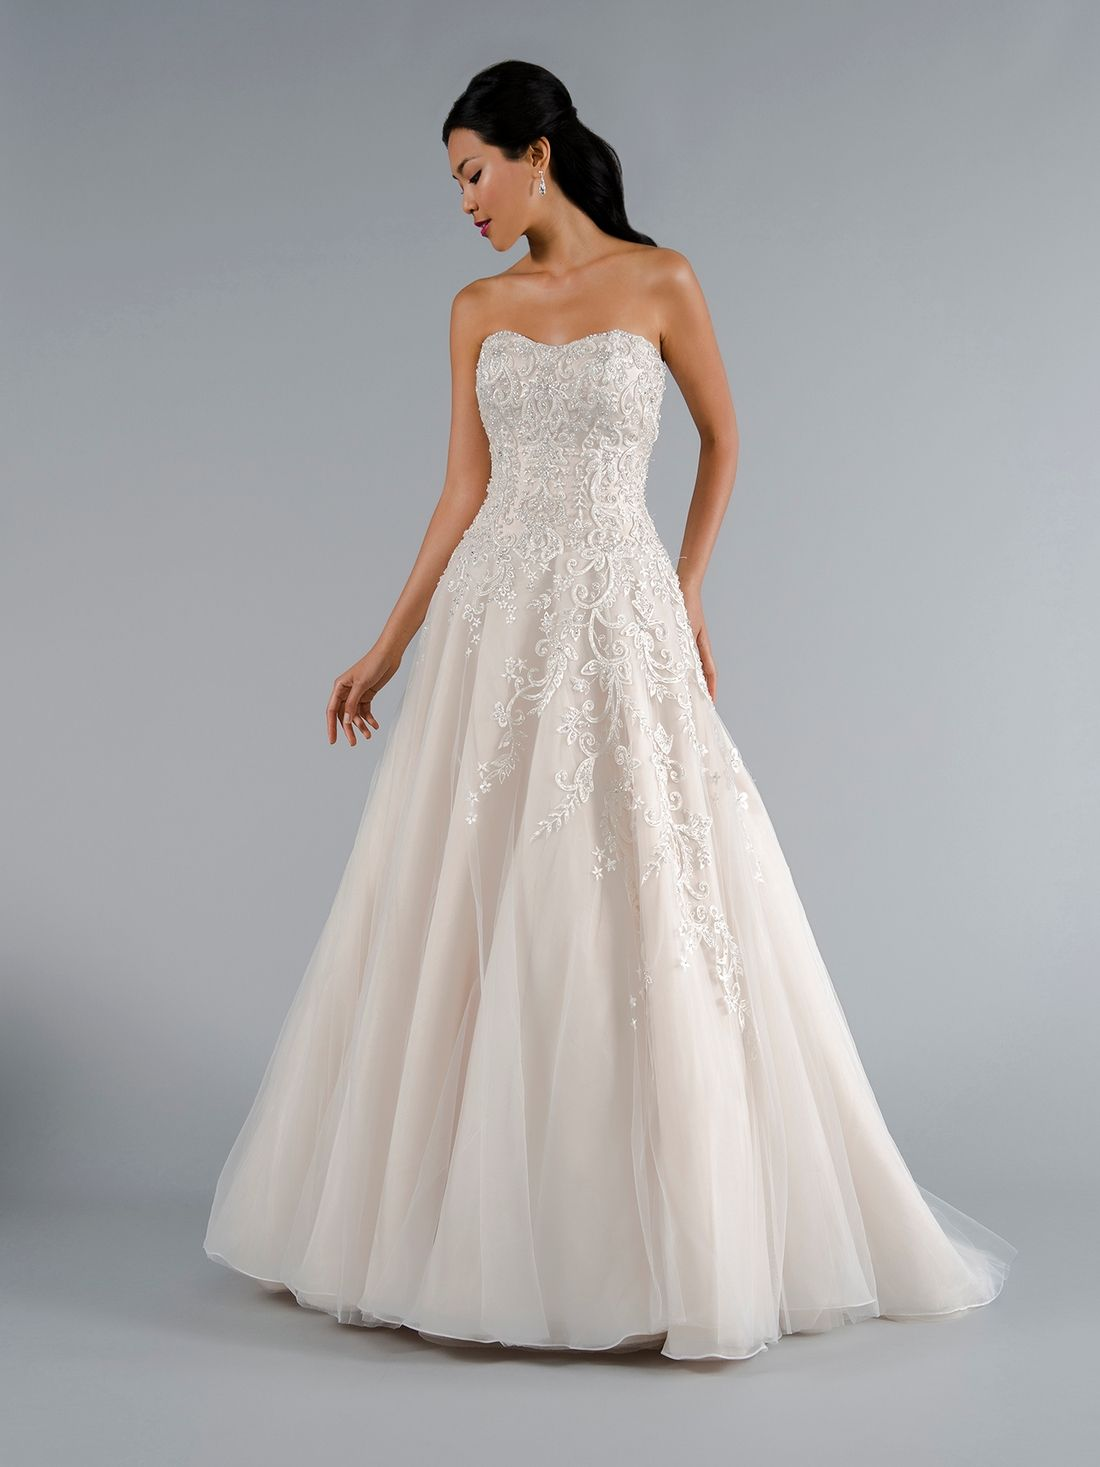 KleinfeldBridal.com: MZ2 by Mark Zunino: Bridal Gown: 33089657: A ...